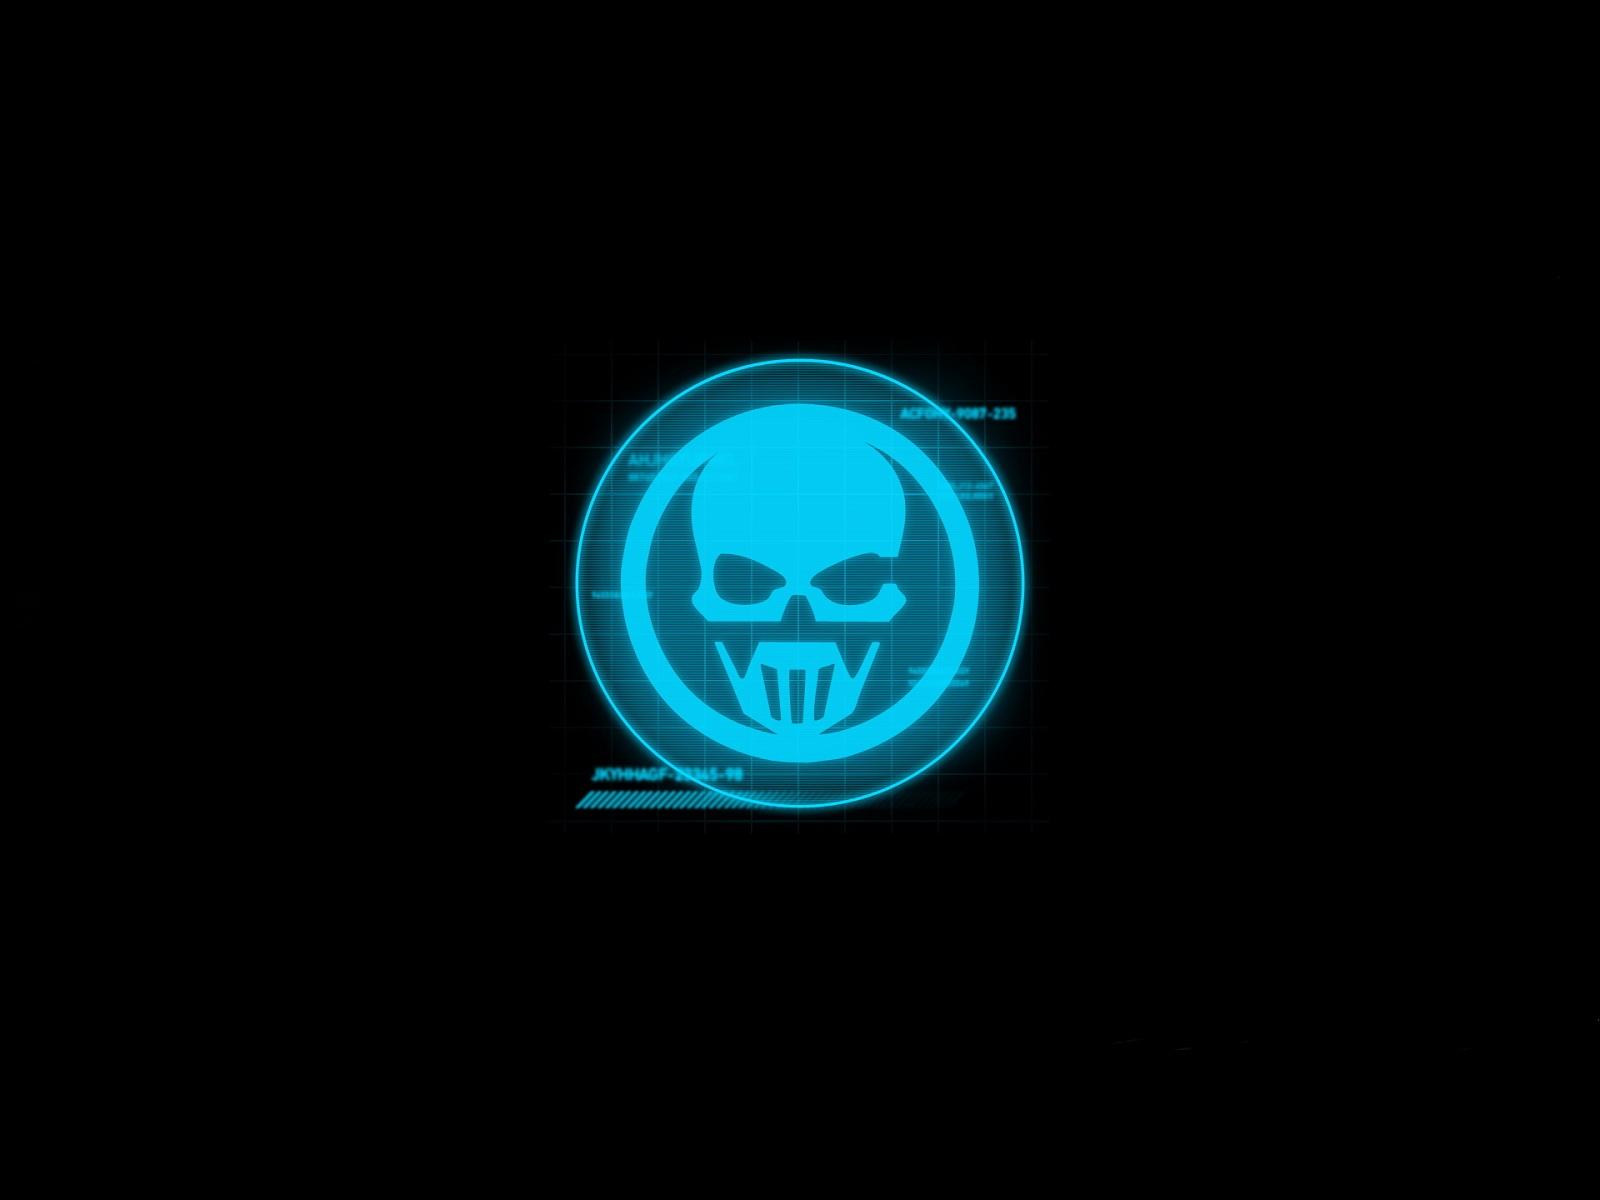 ghost recon online ghost recon online ghost recon online 1600x1200